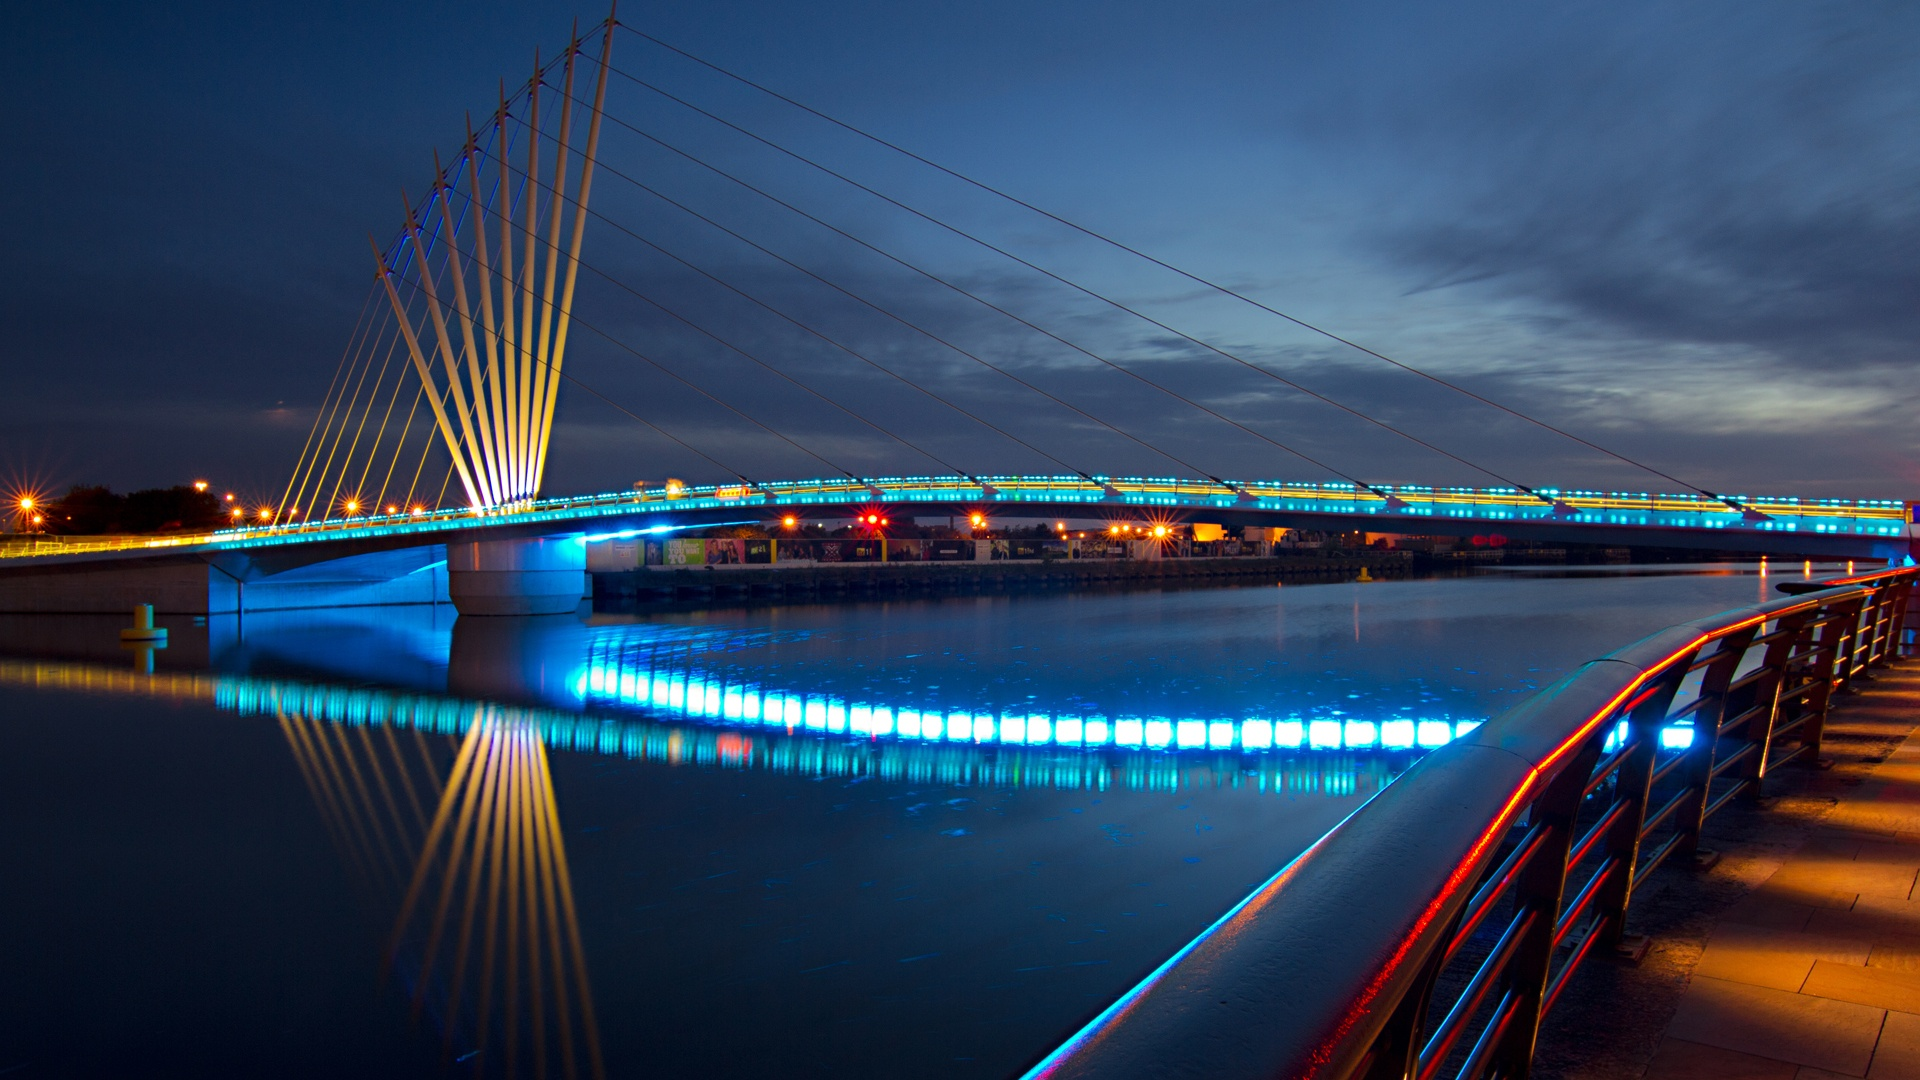 light bridge wallpaper - photo #5